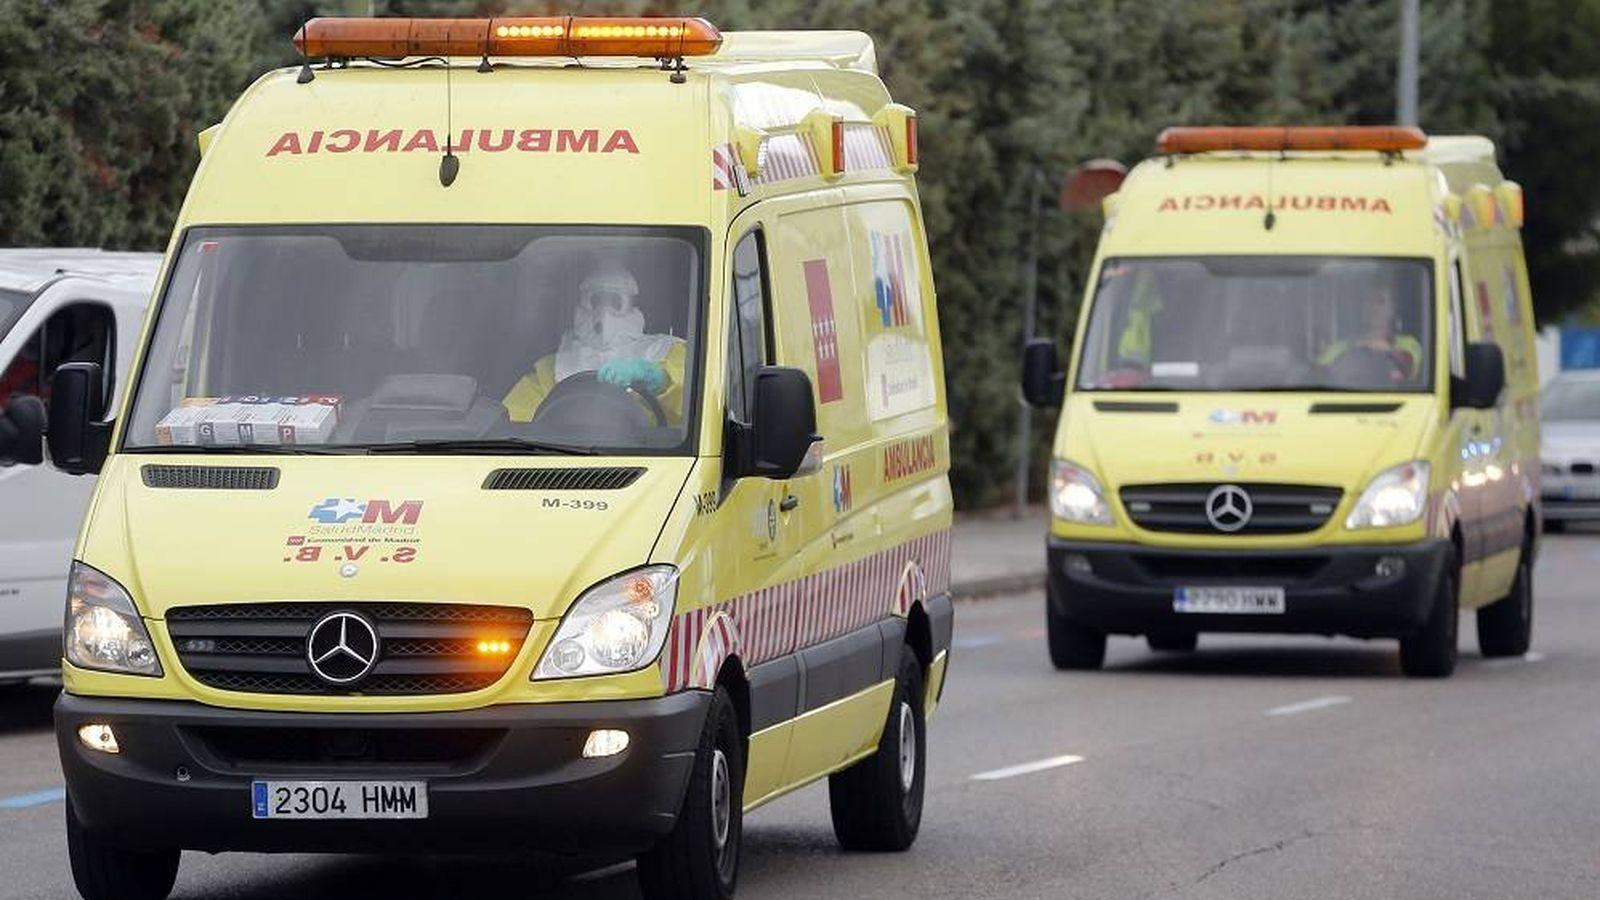 Foto: Una ambulancia circula por la carretera - Archivo. (Reuters)